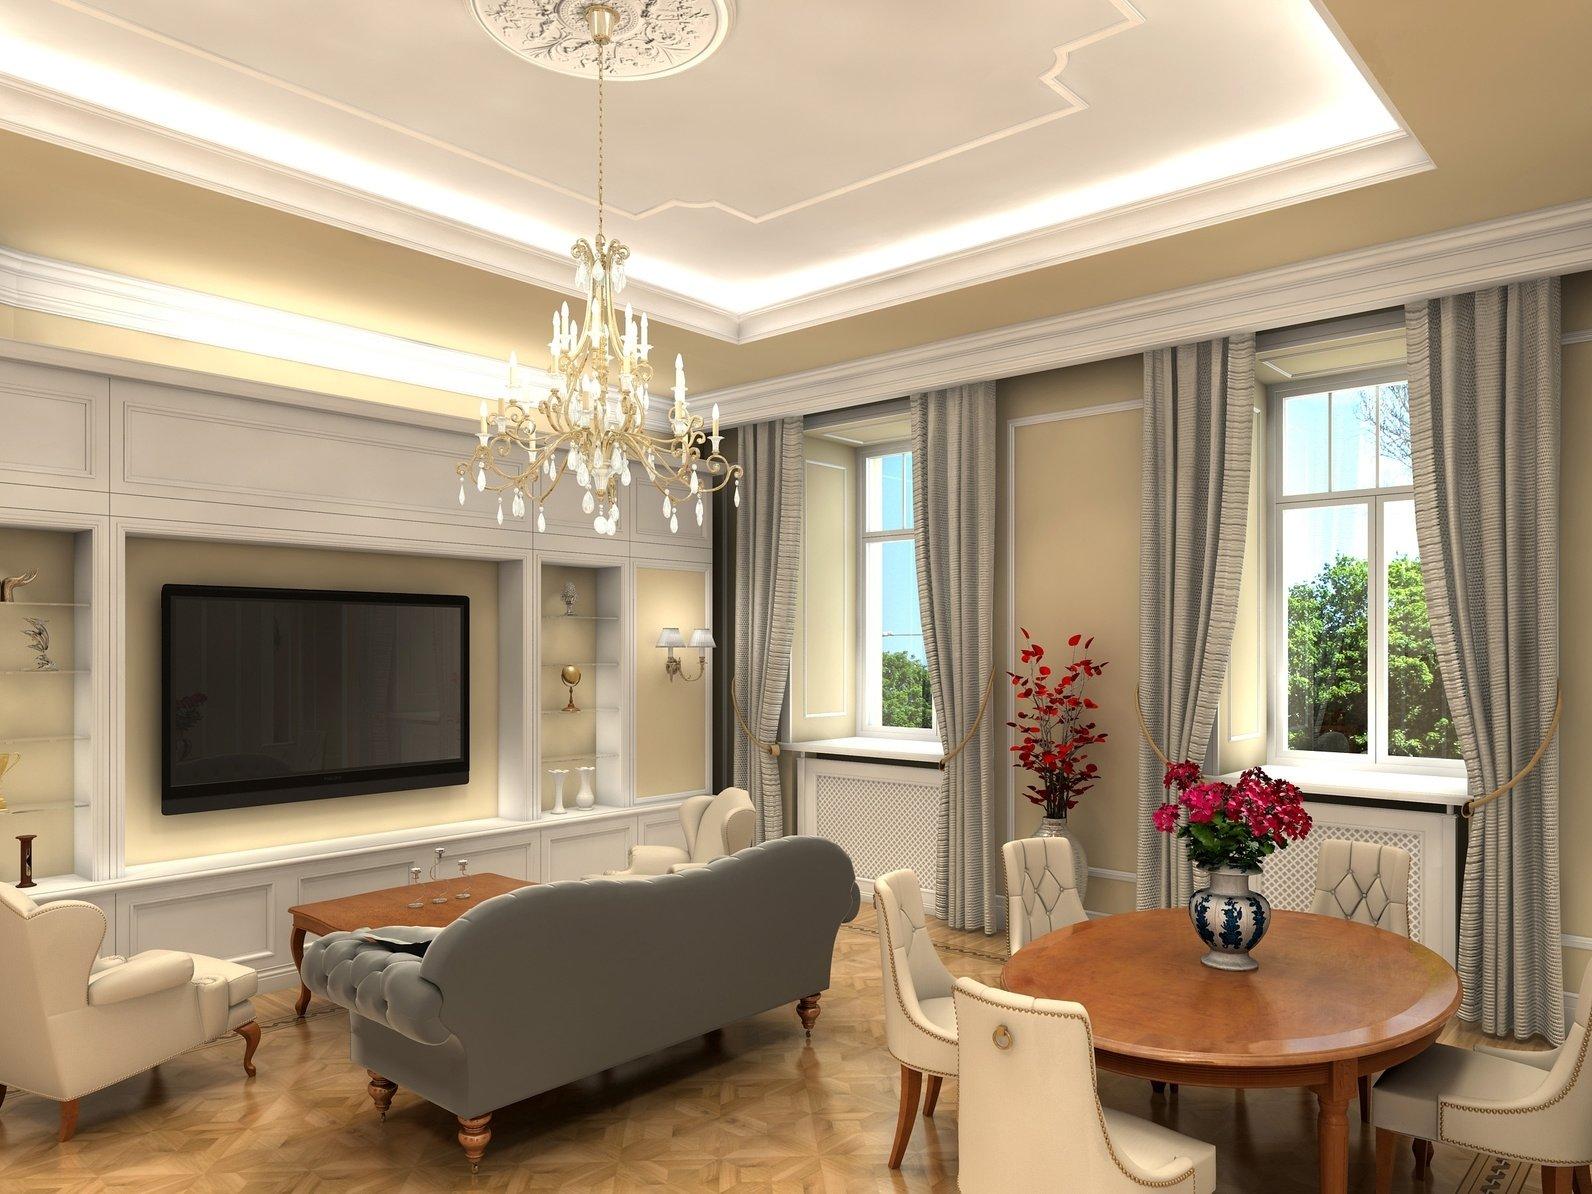 10 Cute Windows Treatment Ideas For Living Room 5 unique window treatment ideas for your living room marvin windows nj